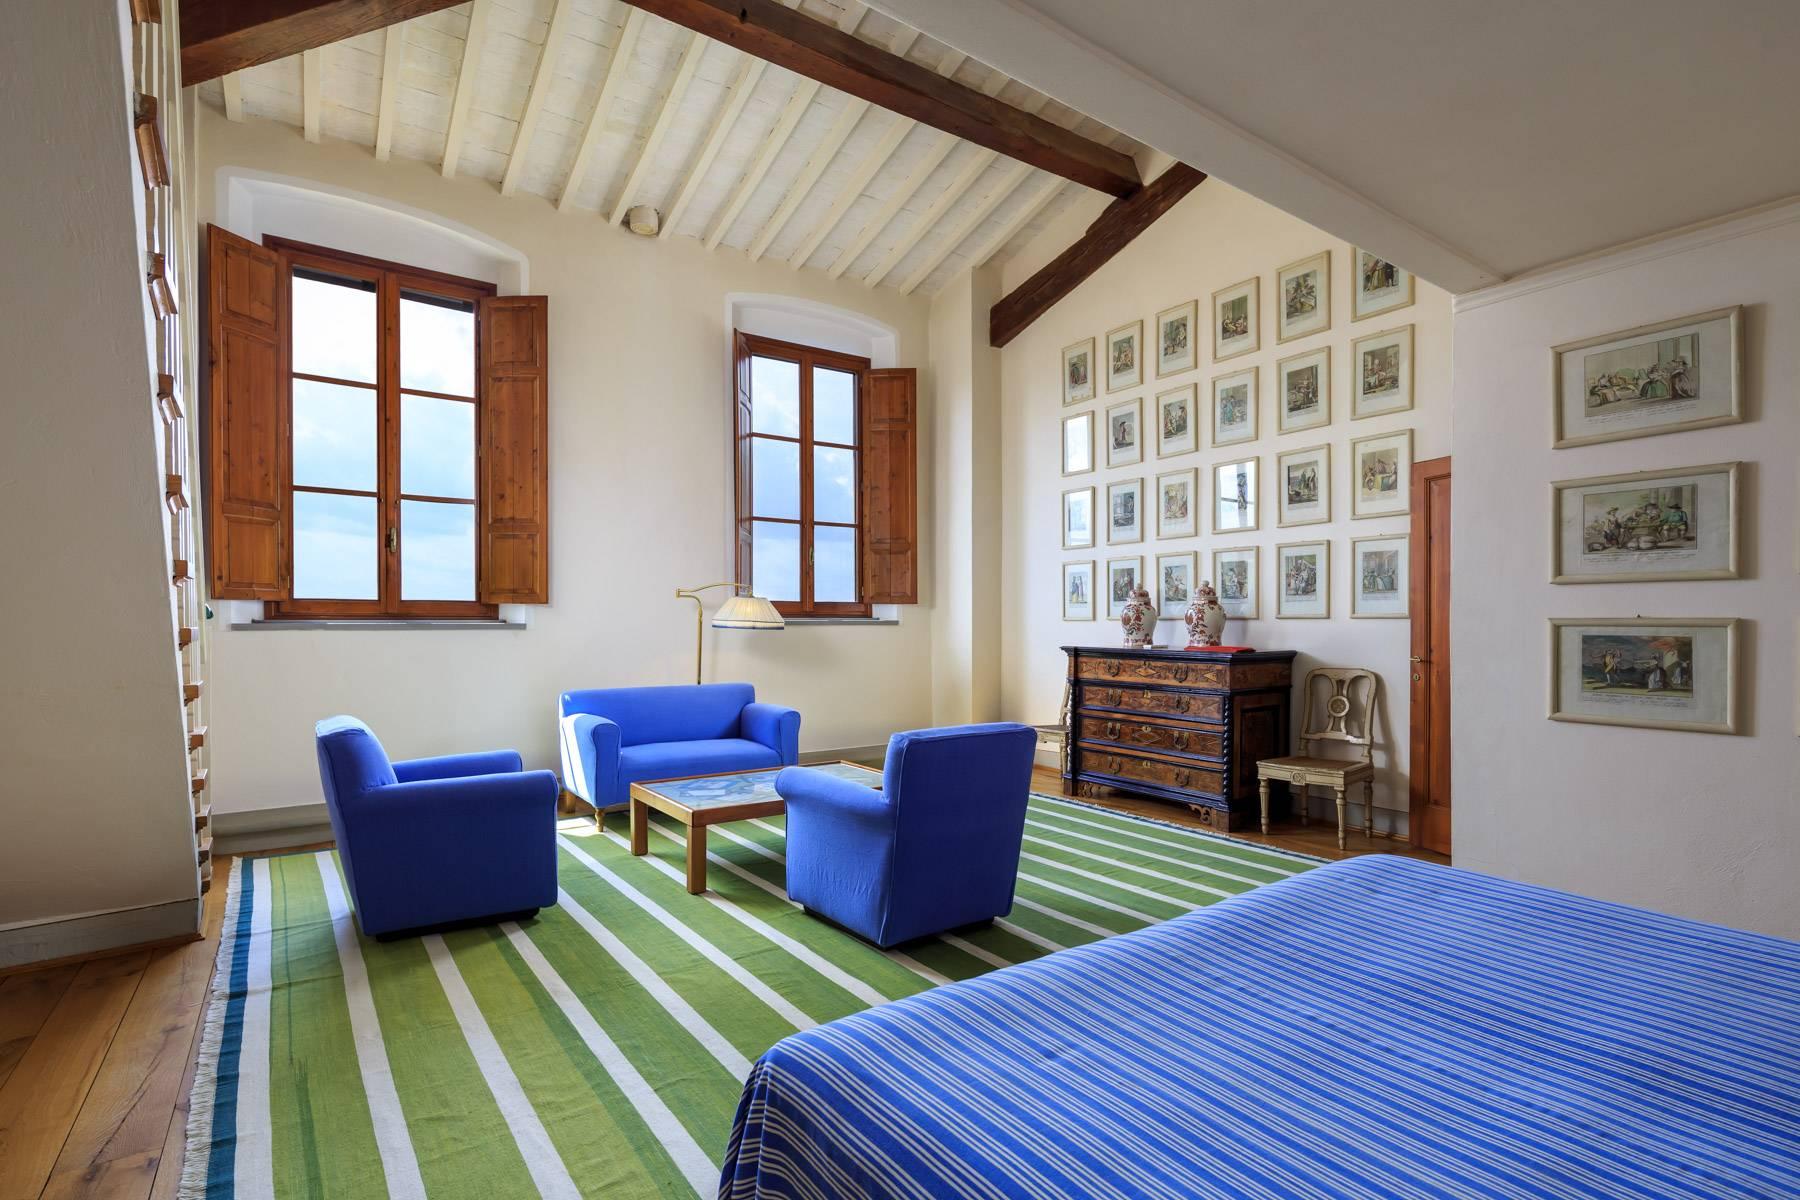 Villa in Affitto a Firenze: 5 locali, 600 mq - Foto 25